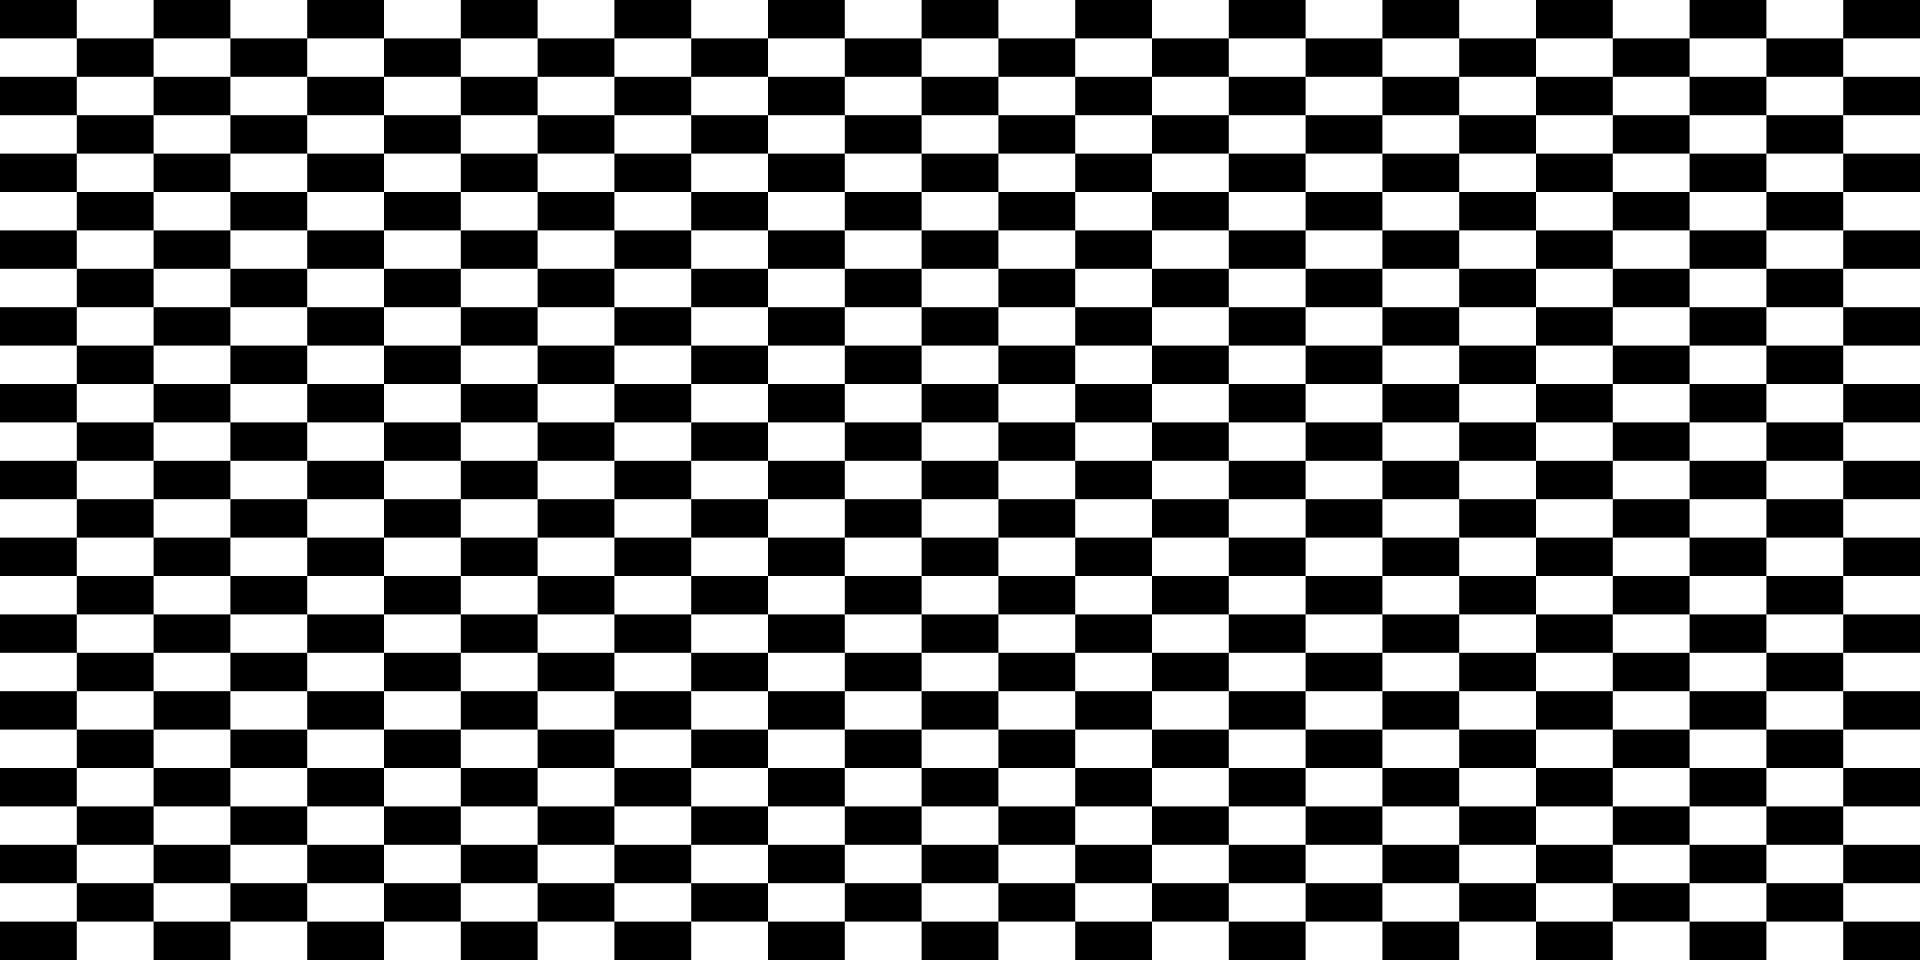 Black-white-1px-checkers.svg